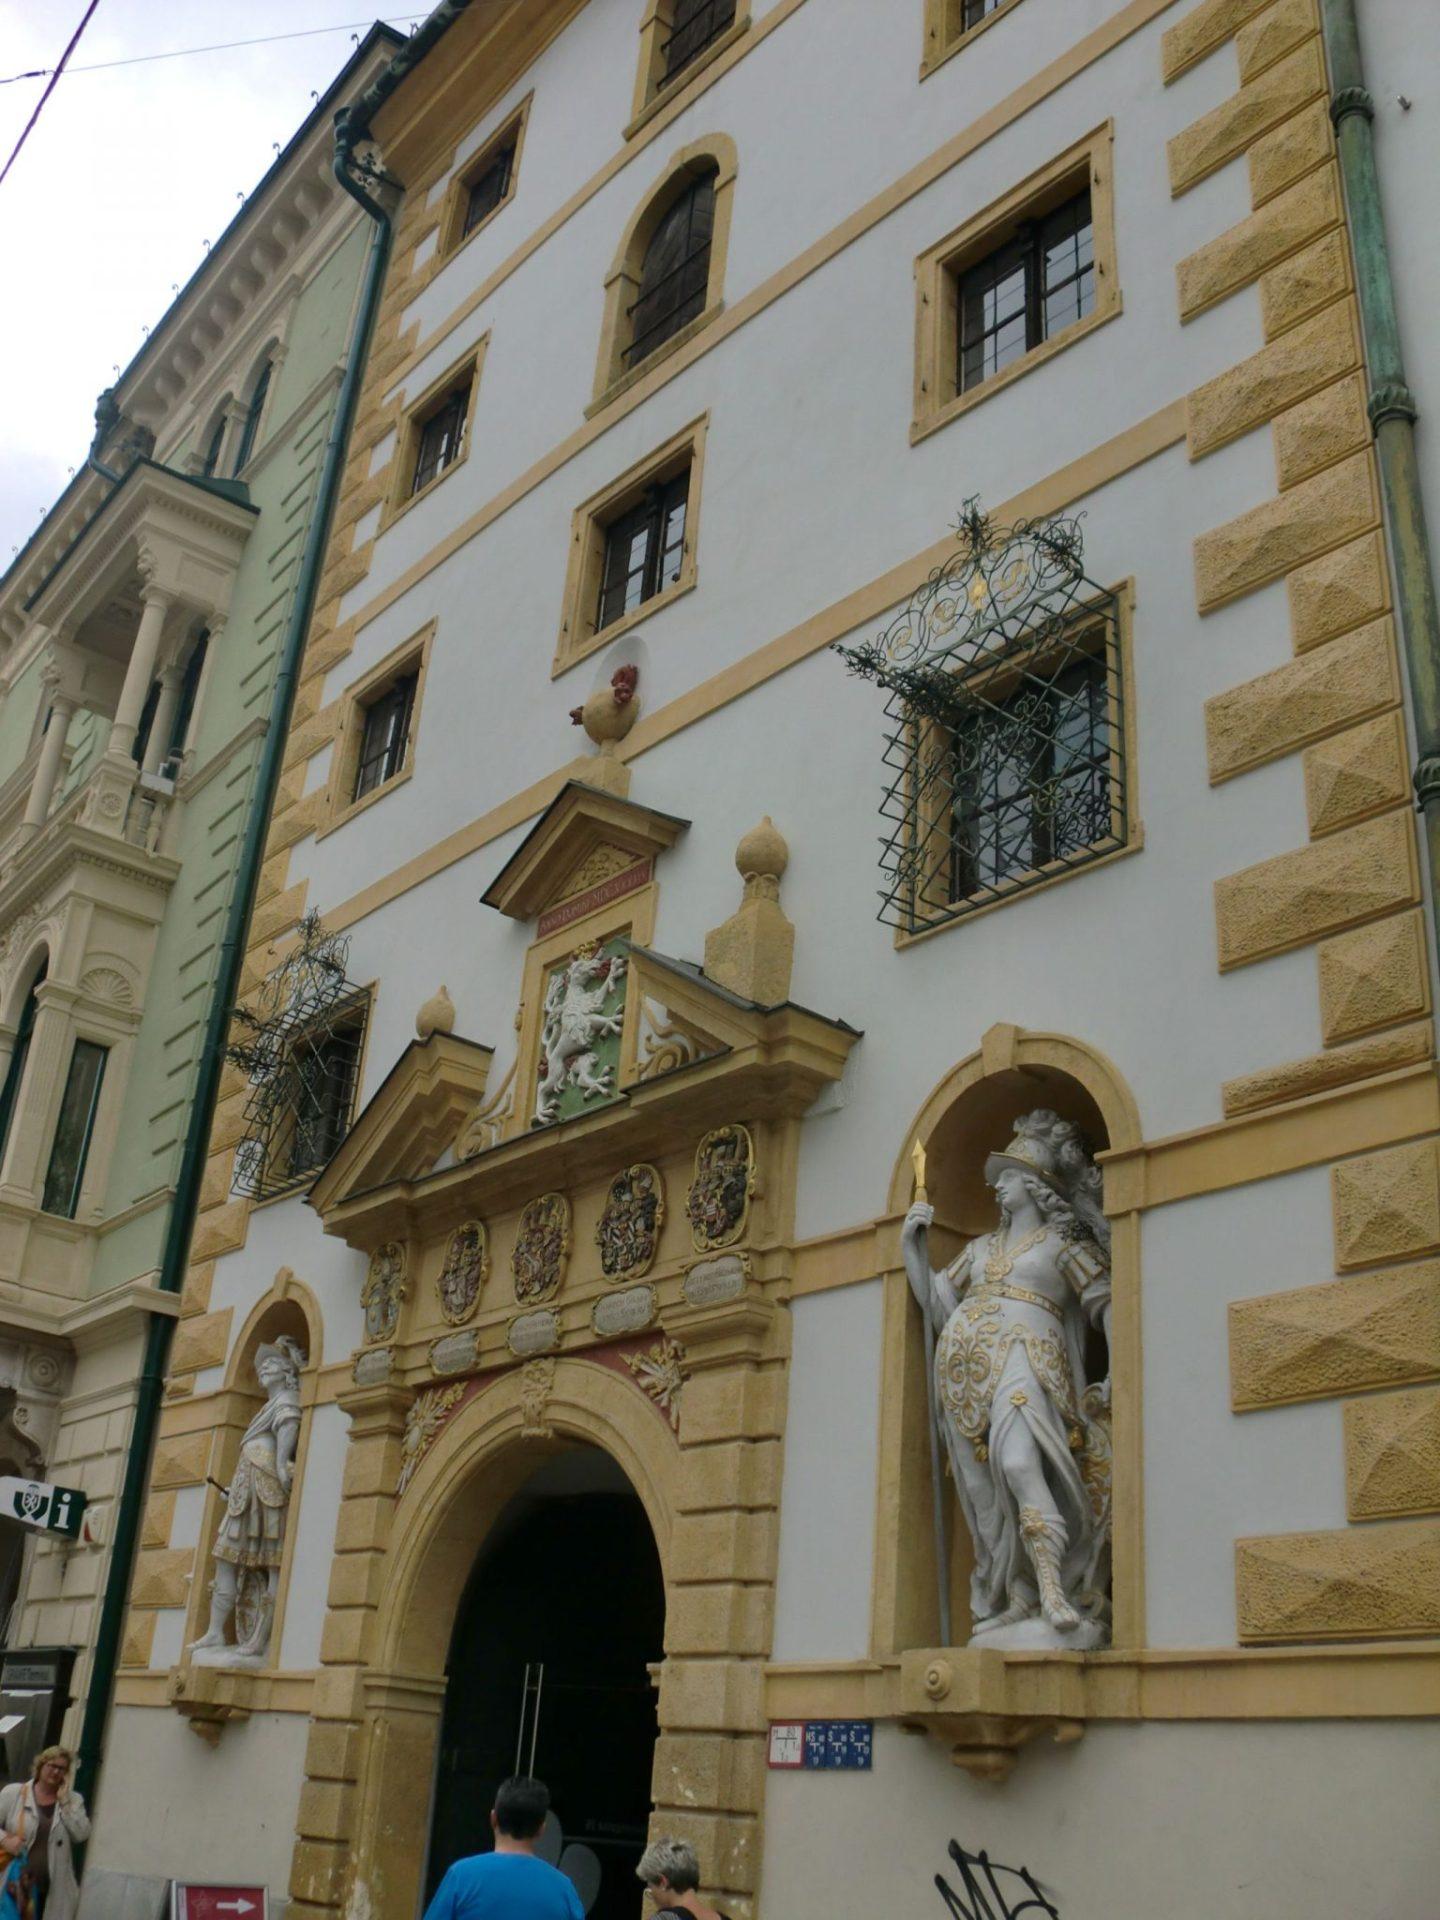 Graz museum entrance 2 - Graz: tradition and modernity